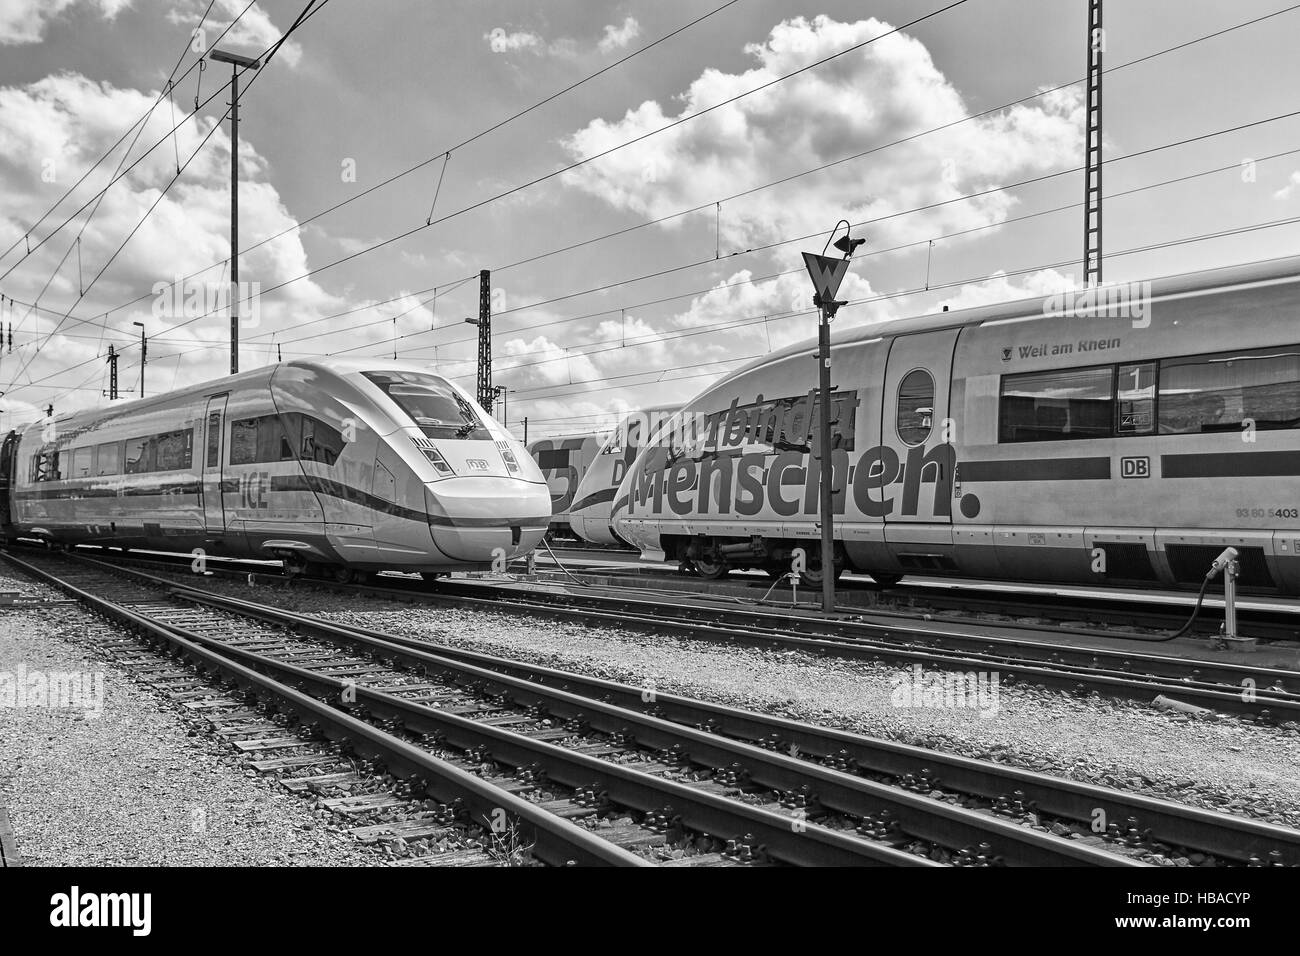 Deutsche Bahn: ICE-Trains in Berlin-Grunewald Stock Foto